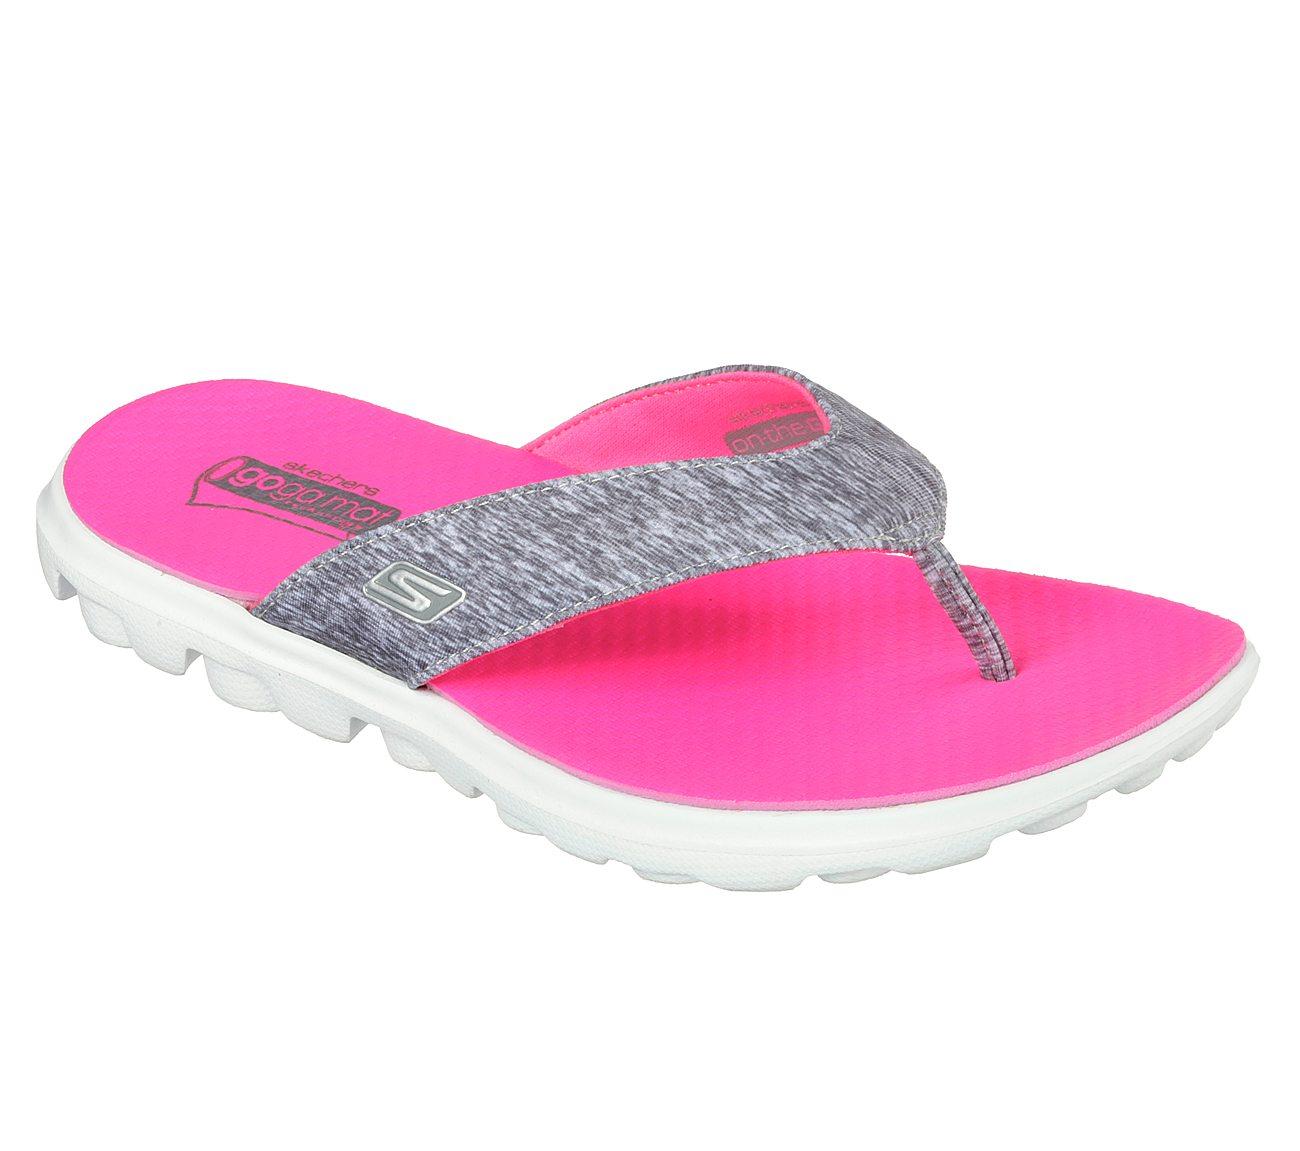 fd5d288c2456 Buy skechers flip flops with memory foam   OFF43% Discounted